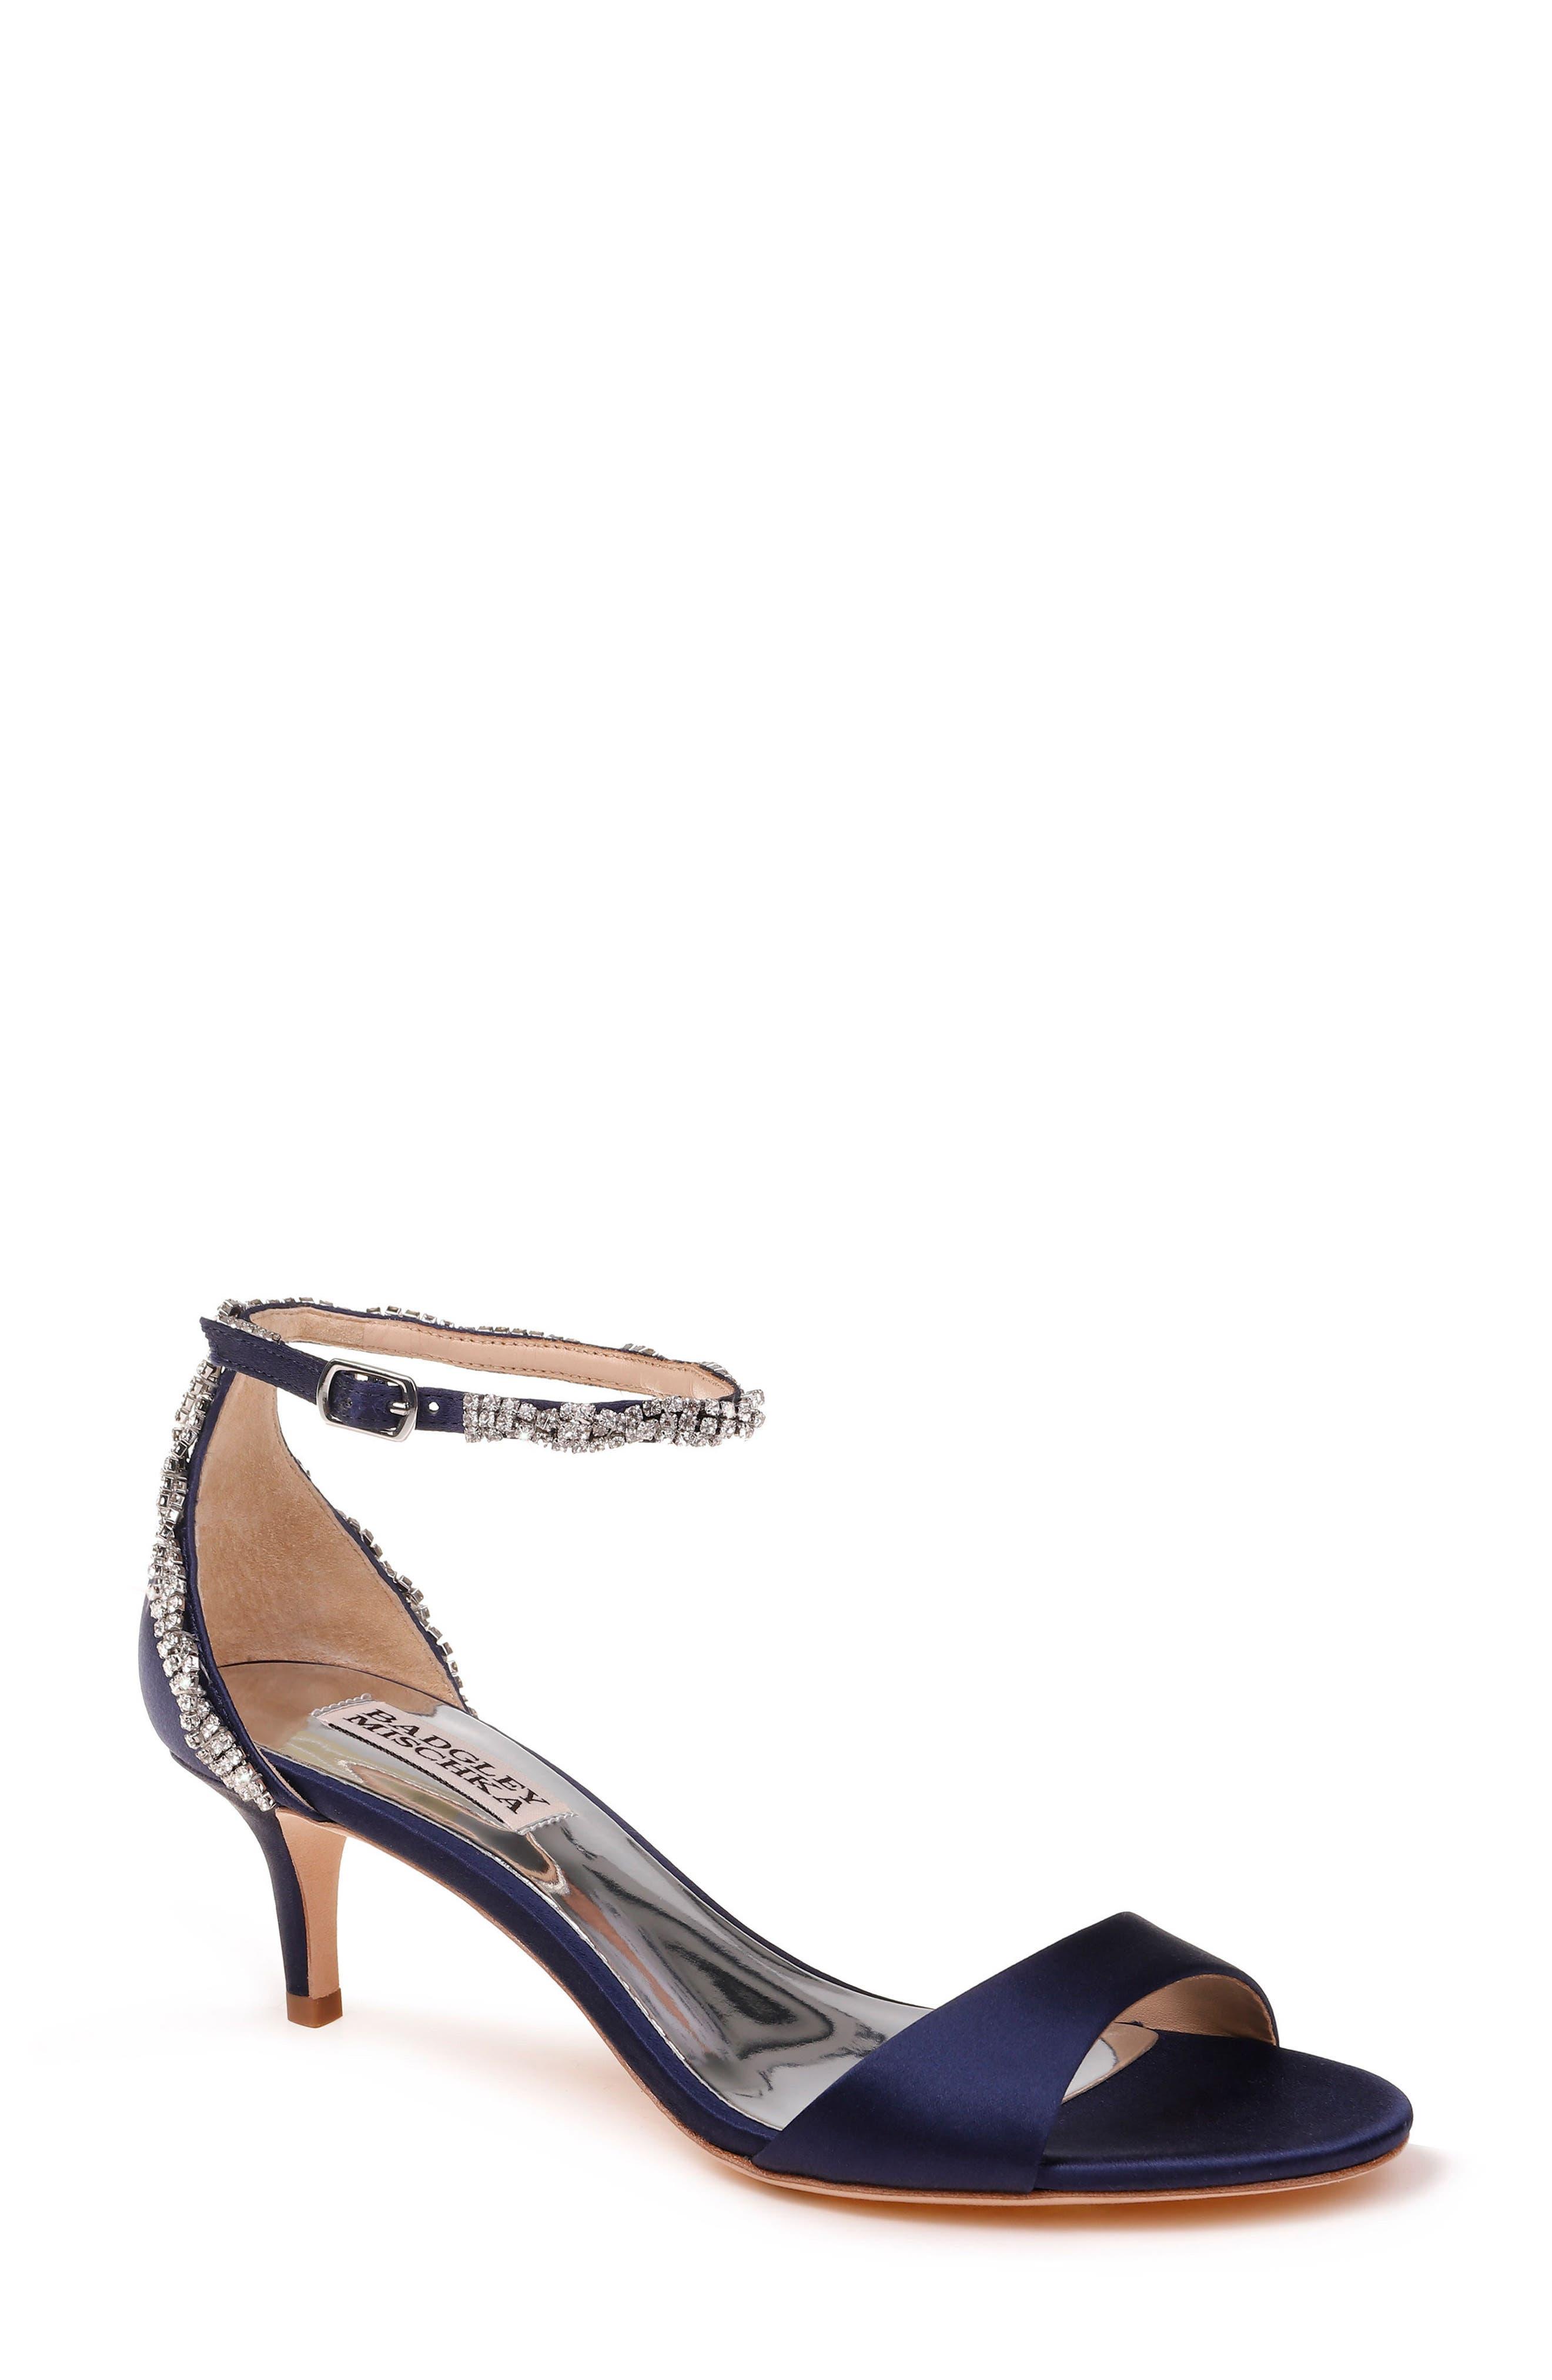 Yareli Crystal Embellished Sandal,                         Main,                         color, MIDNIGHT SATIN